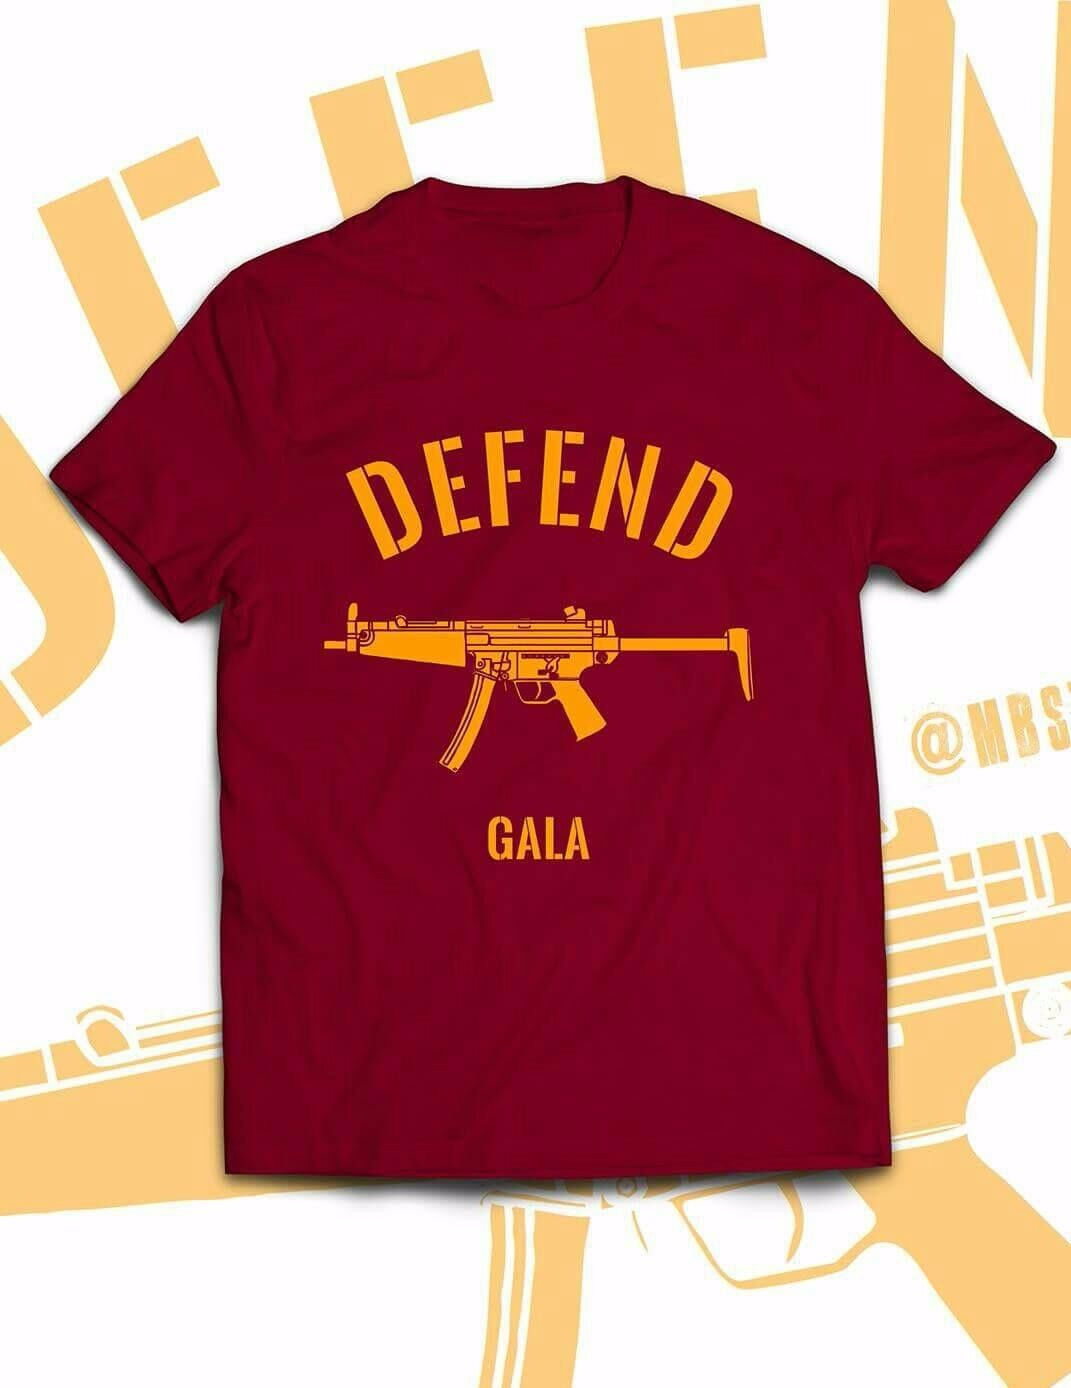 Defend GALA  Galatasaray Fan T shirt